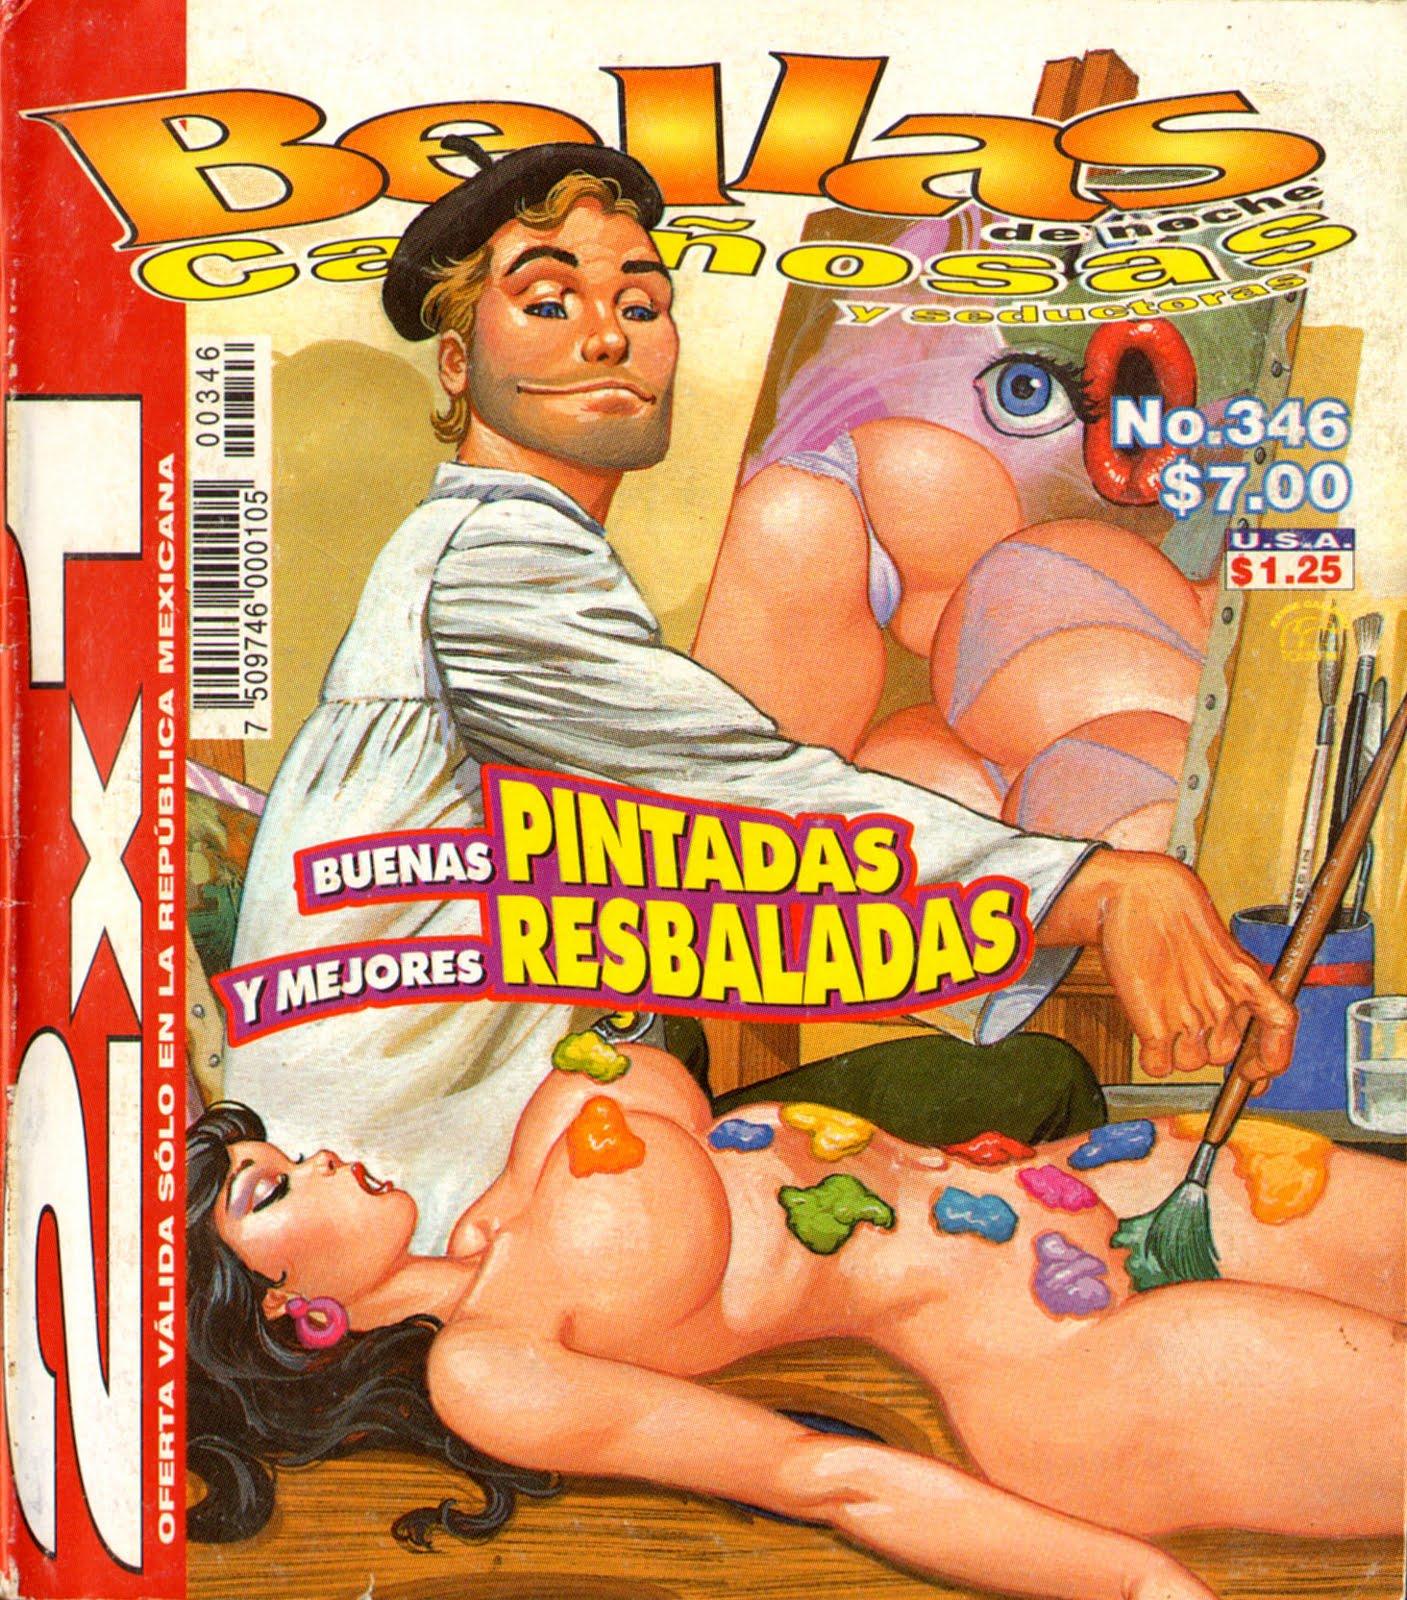 blog mexican porn May 2016  Posted in blogger Mexicano, cuidad de Mexico, Fashion Blogg, Fashion New  York, mexican blogger, Mexico DF, moda en mexico, Moshi, vista.